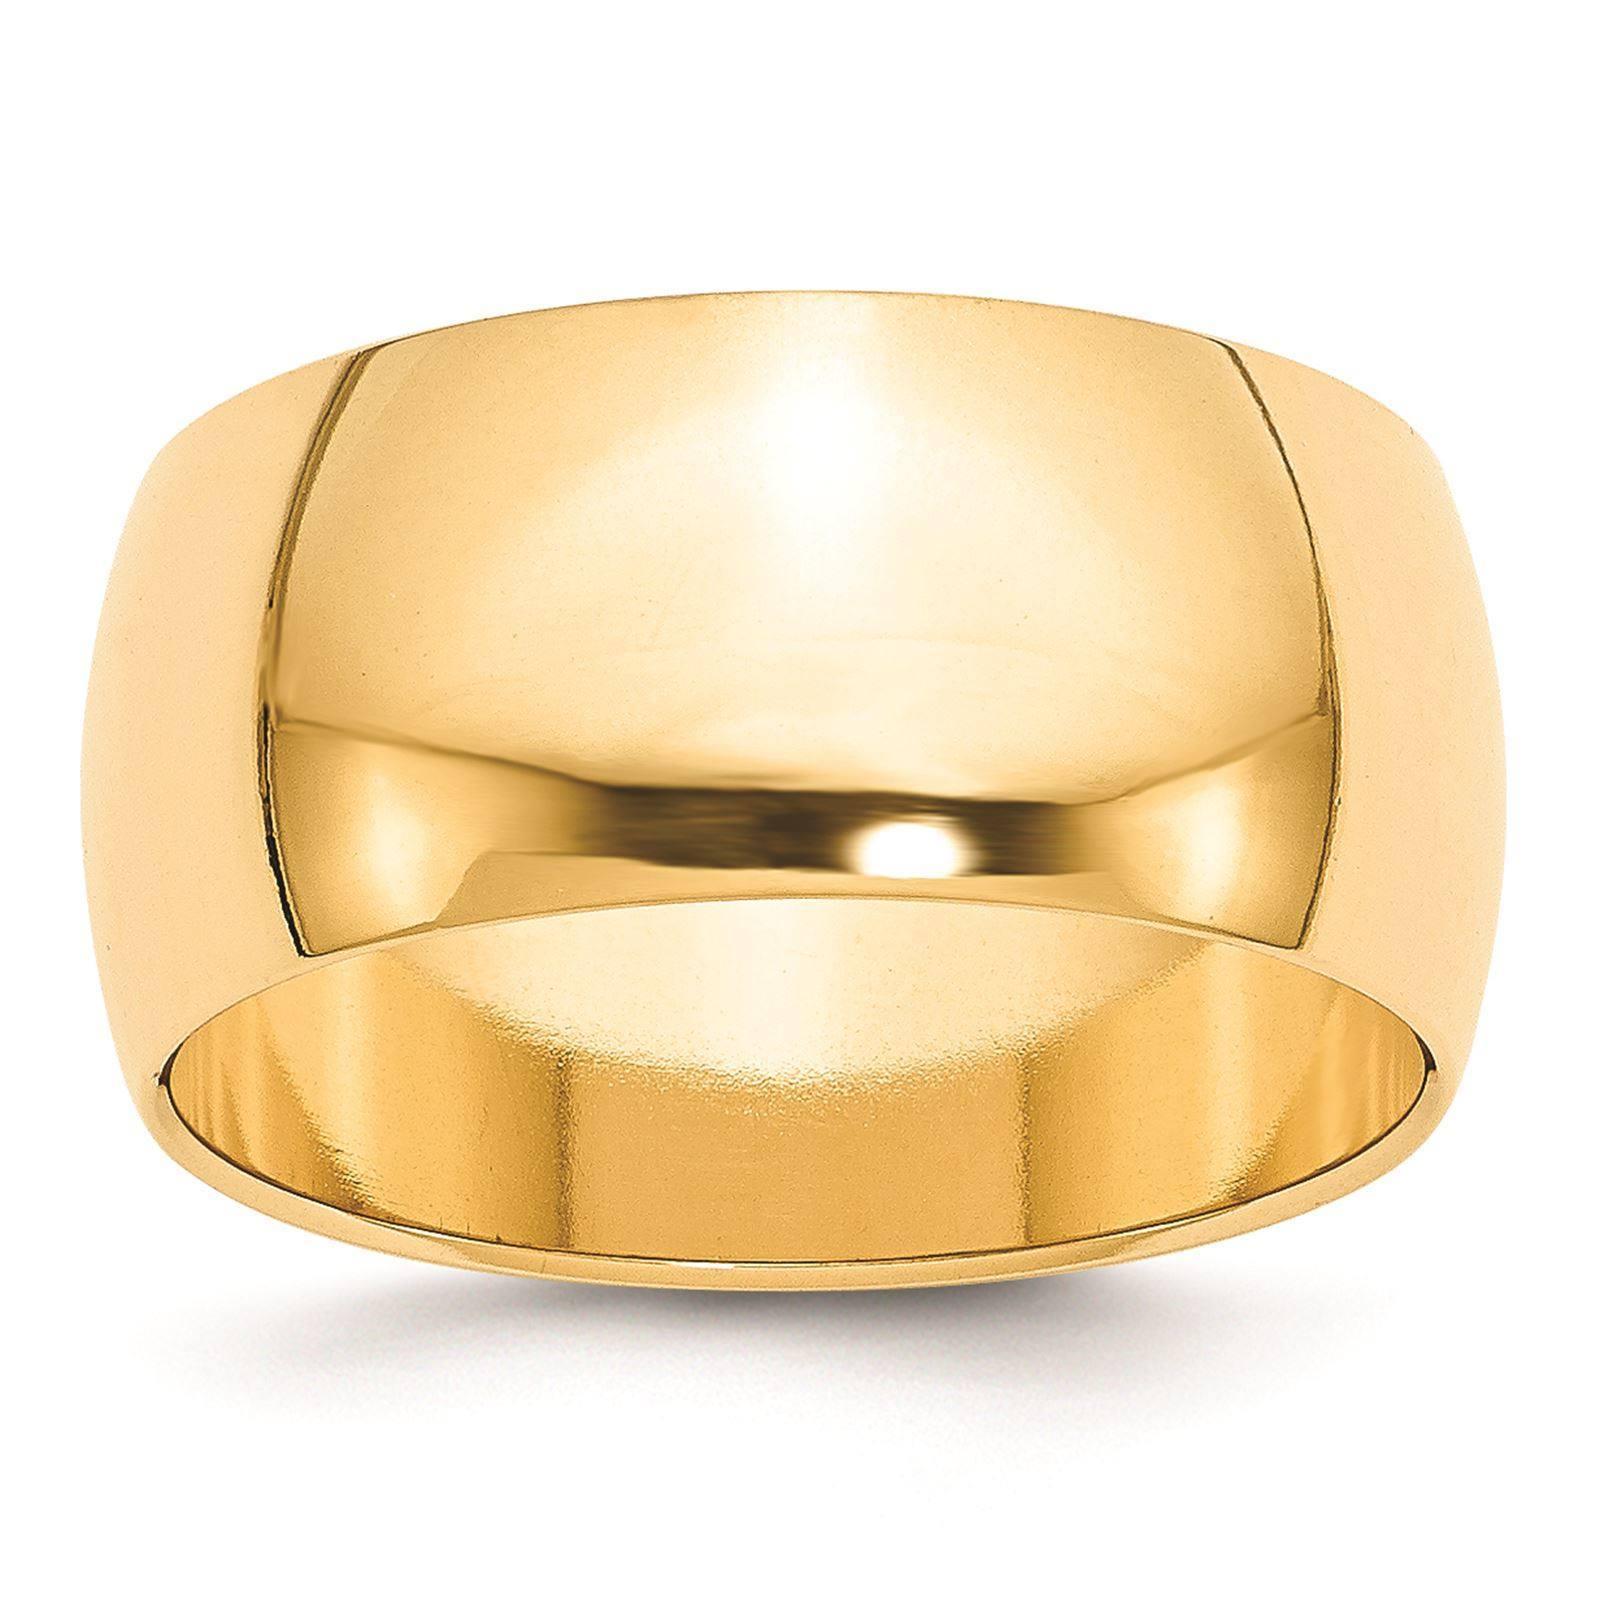 14k Yellow Gold Machined 10mm Polished Half Round Wedding Band Ring Size 12